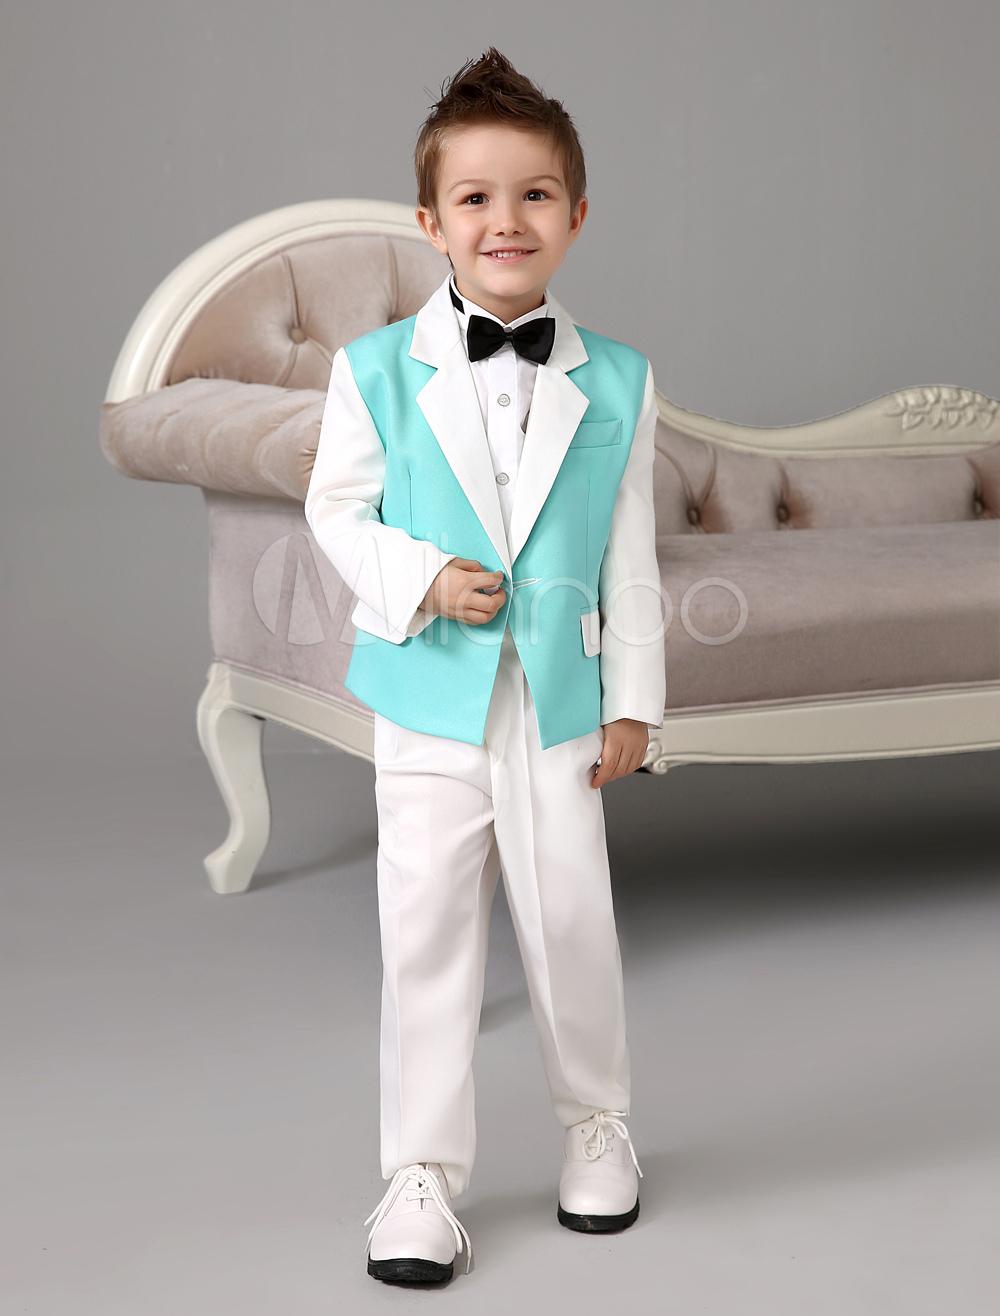 Smart Green Jacket White Sleeve Polyester Kid\'s Ring Bearer Suit ...